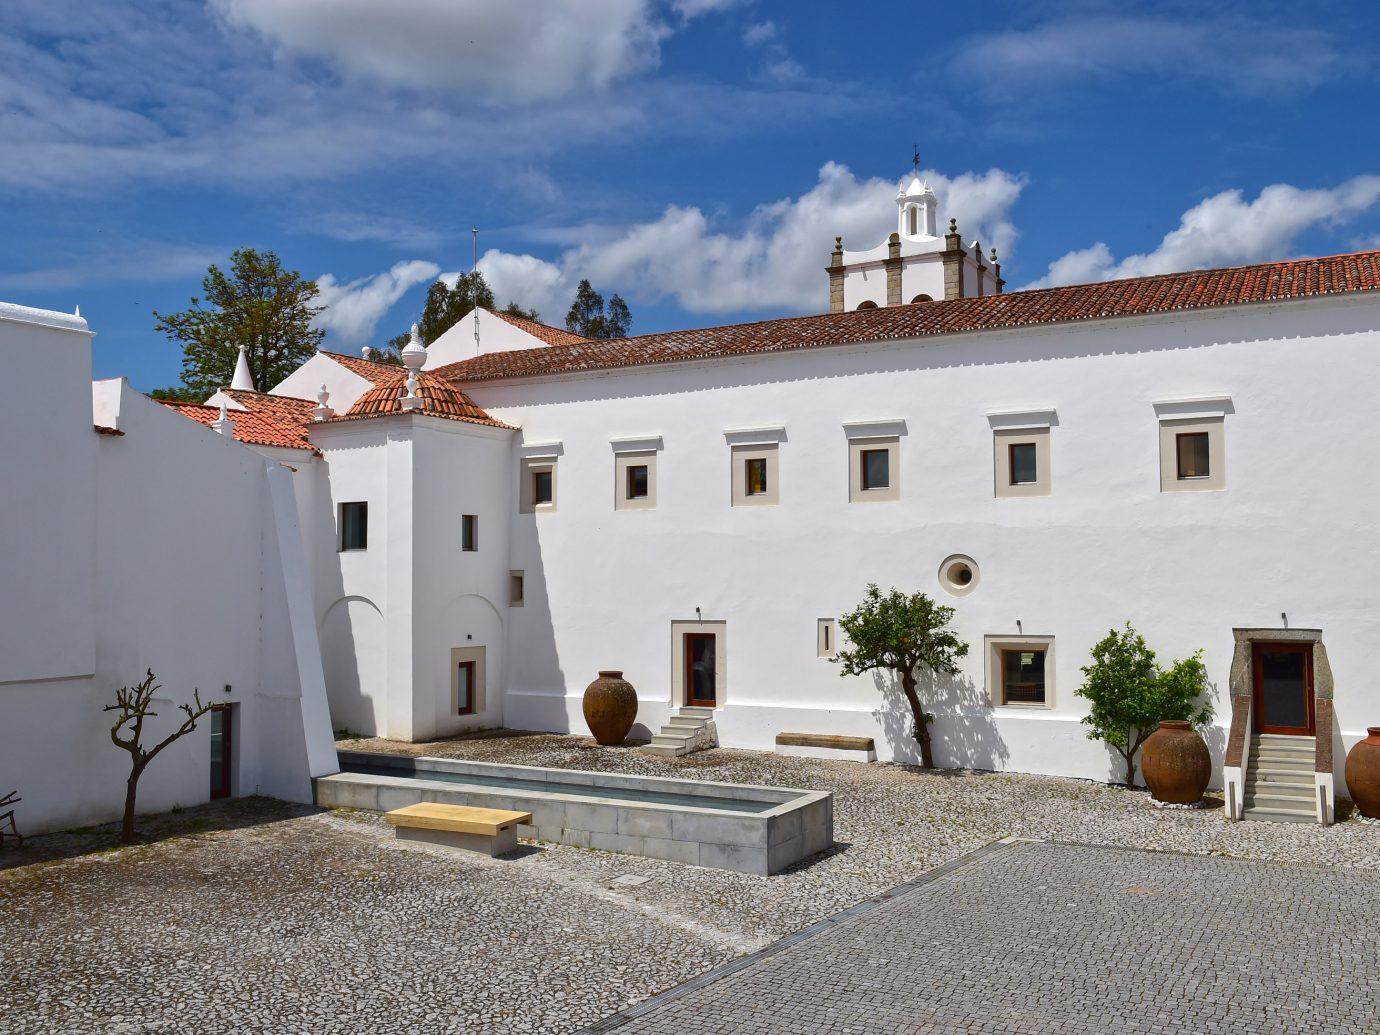 Pousada Convento de Arraiolos, Portugal